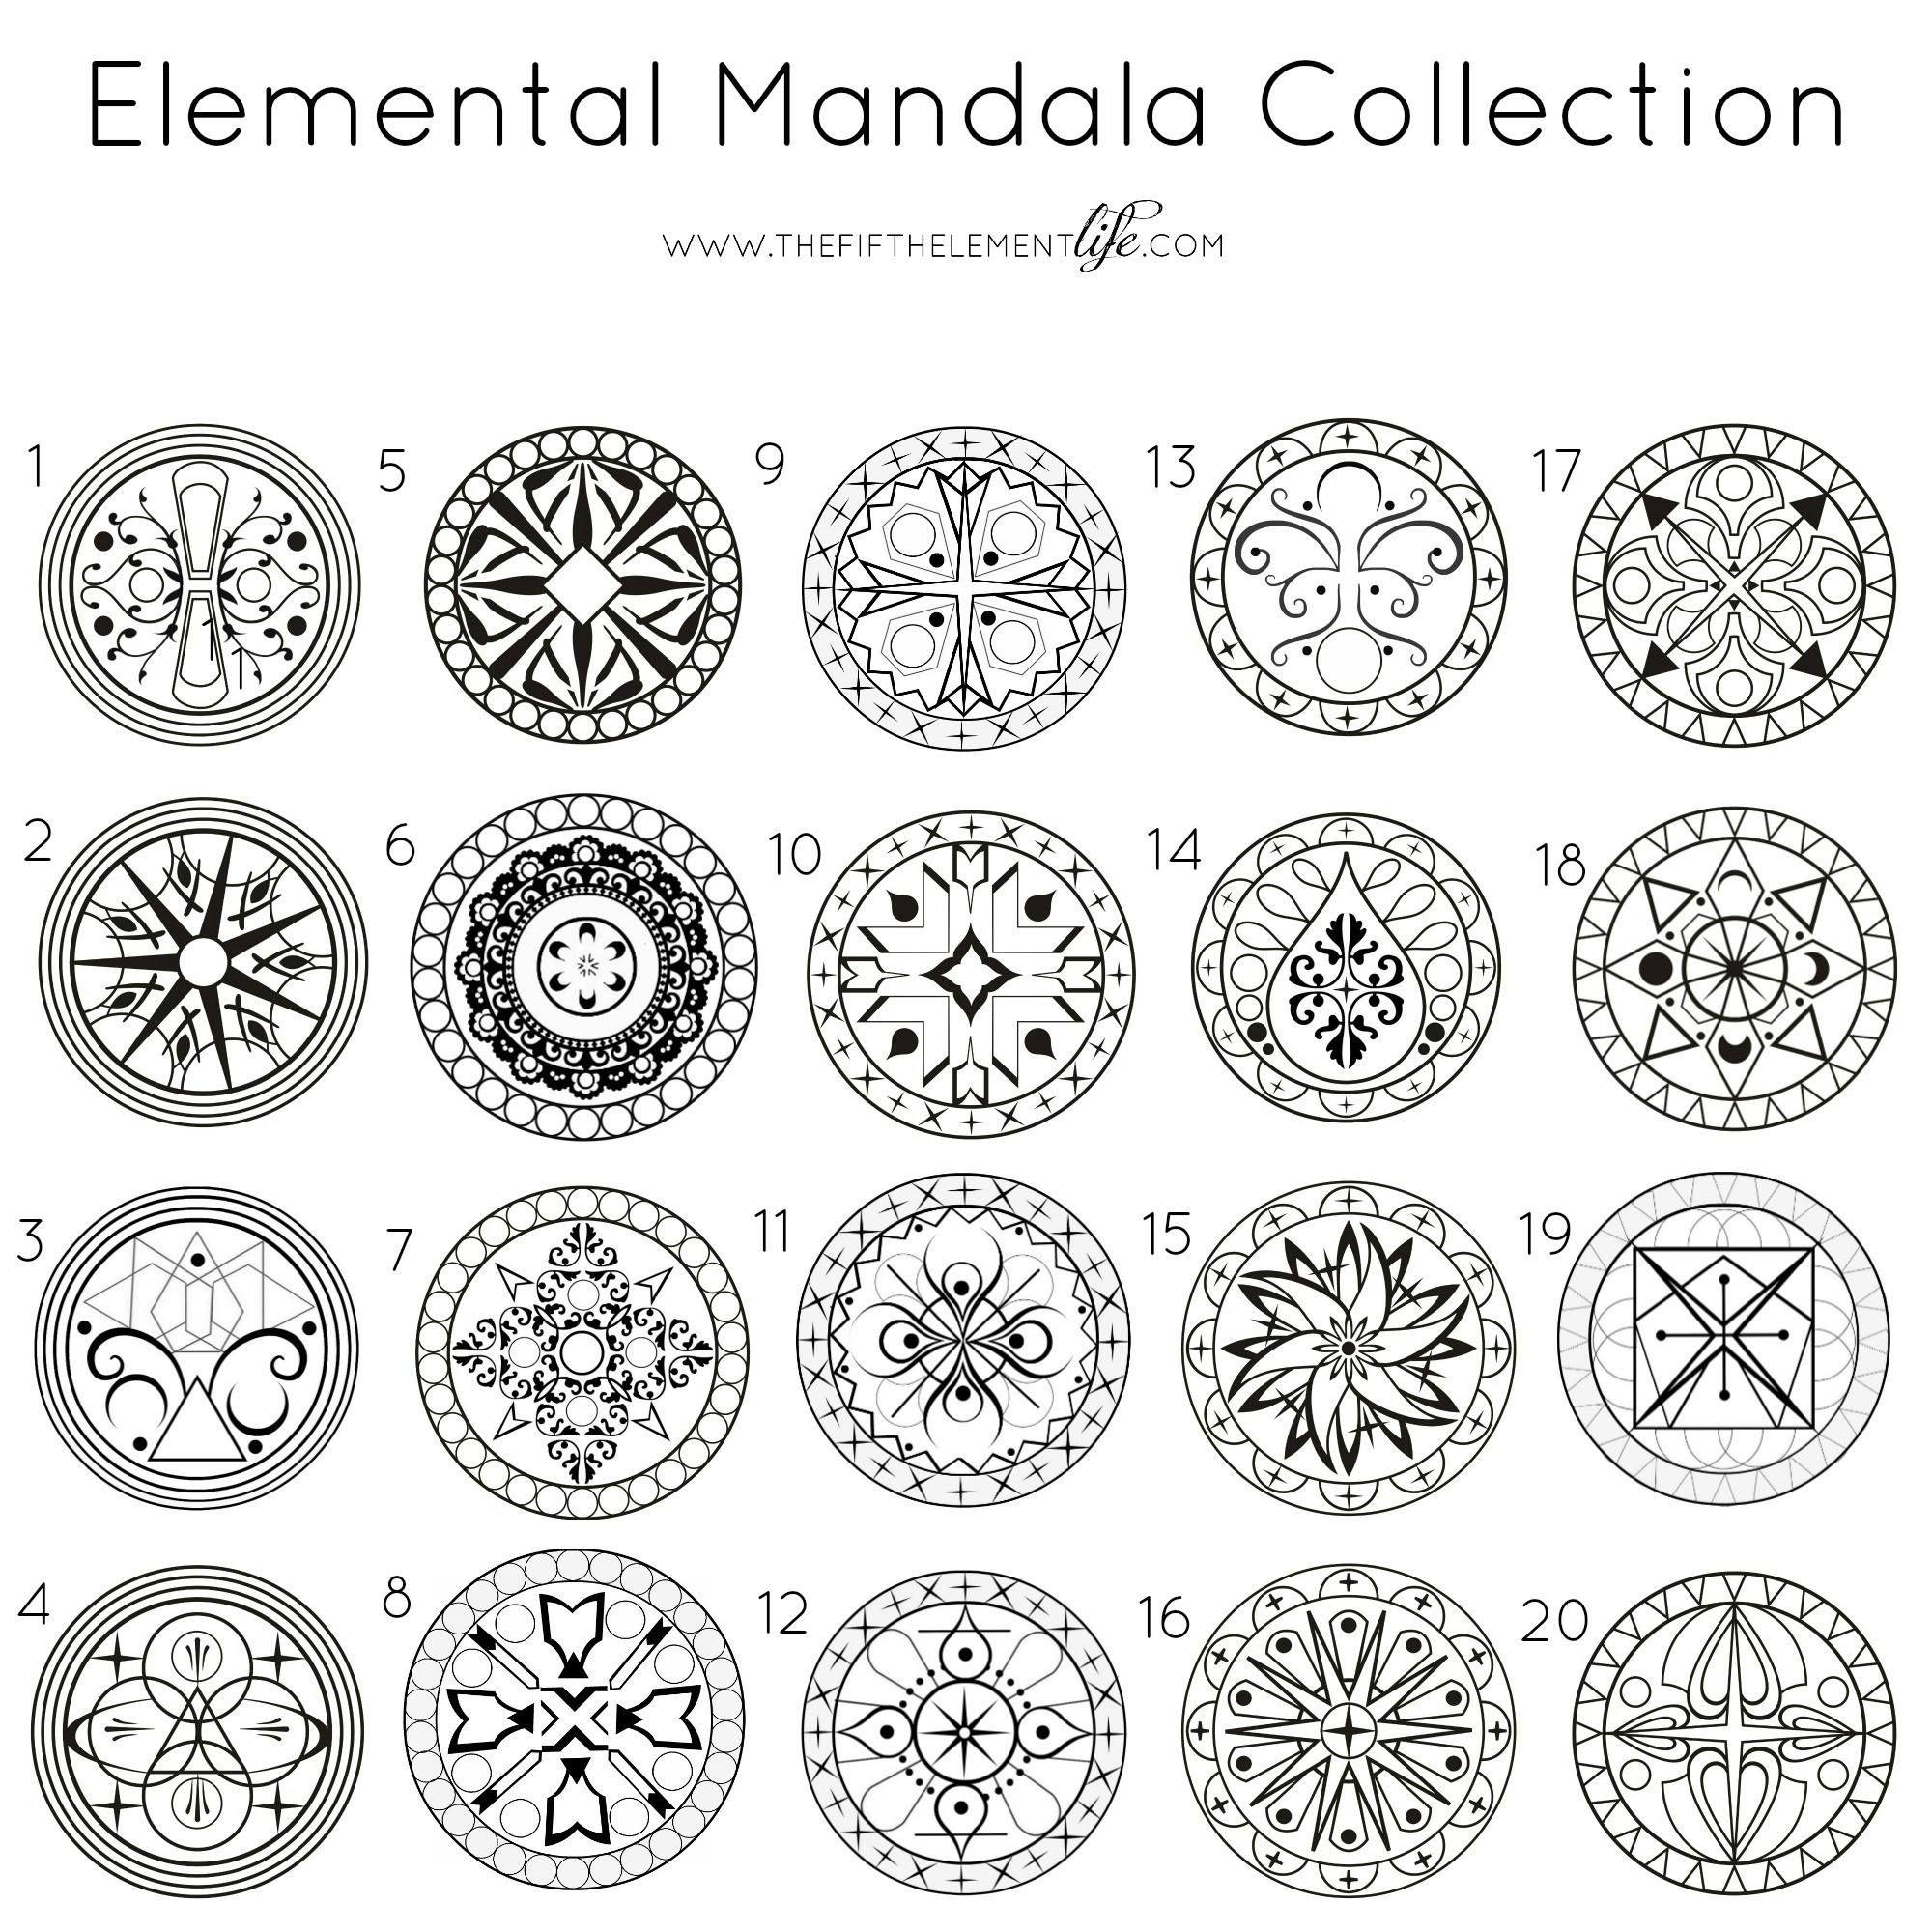 Elemental mandala collection close your eyes for 3 seconds then open and chose a mandala it - Peinture sur galet mandala ...